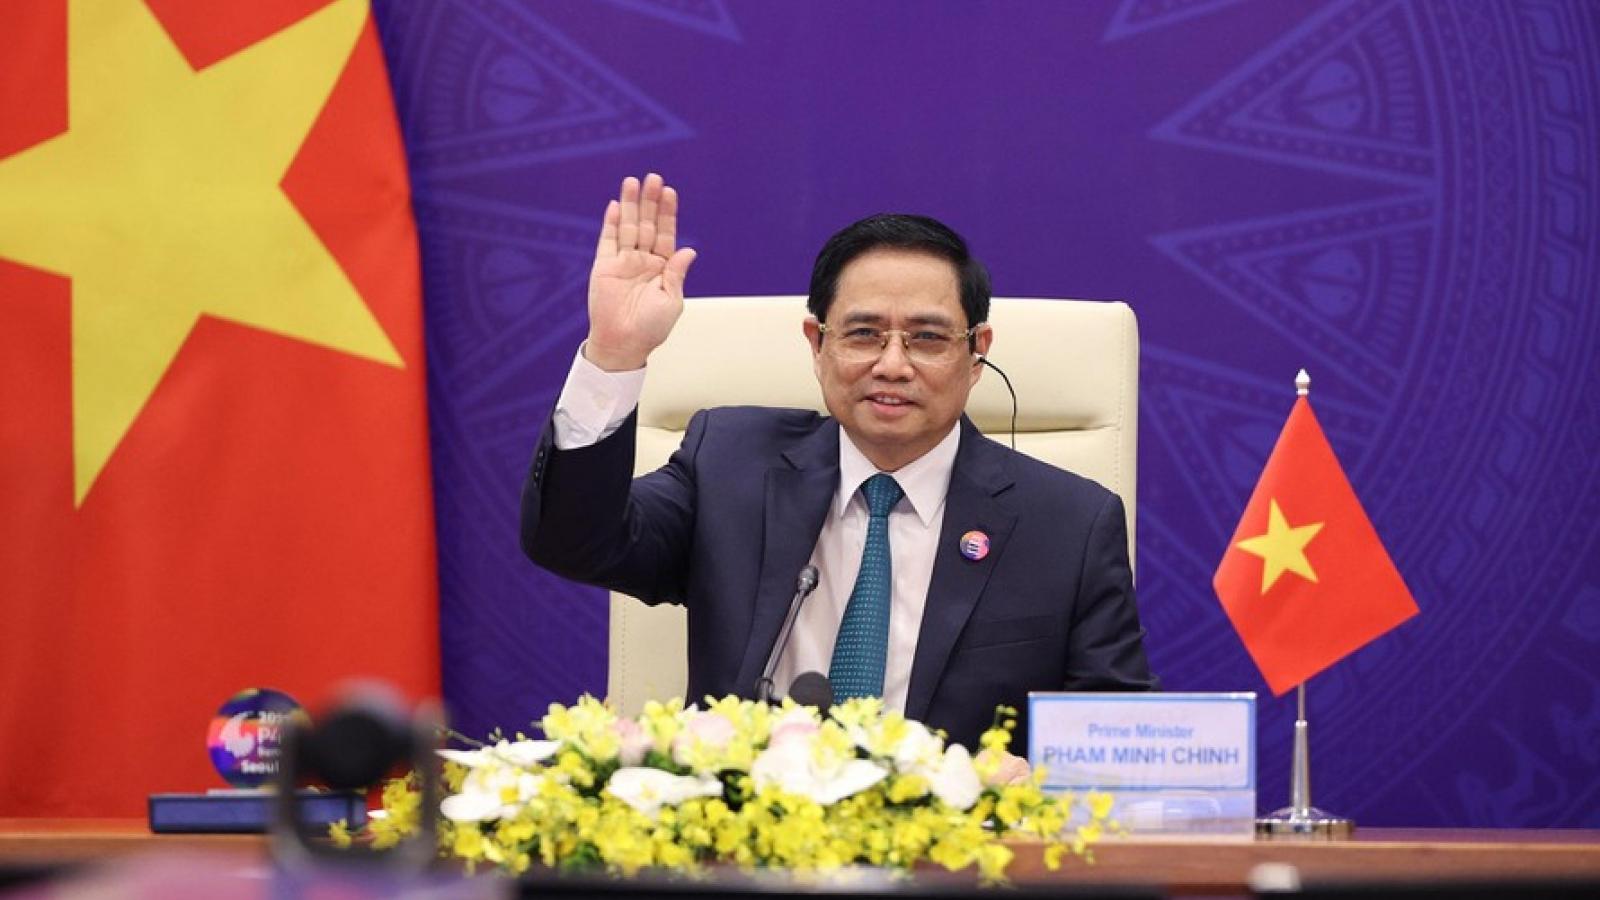 Vietnam proposes major green development solutions in post-COVID era